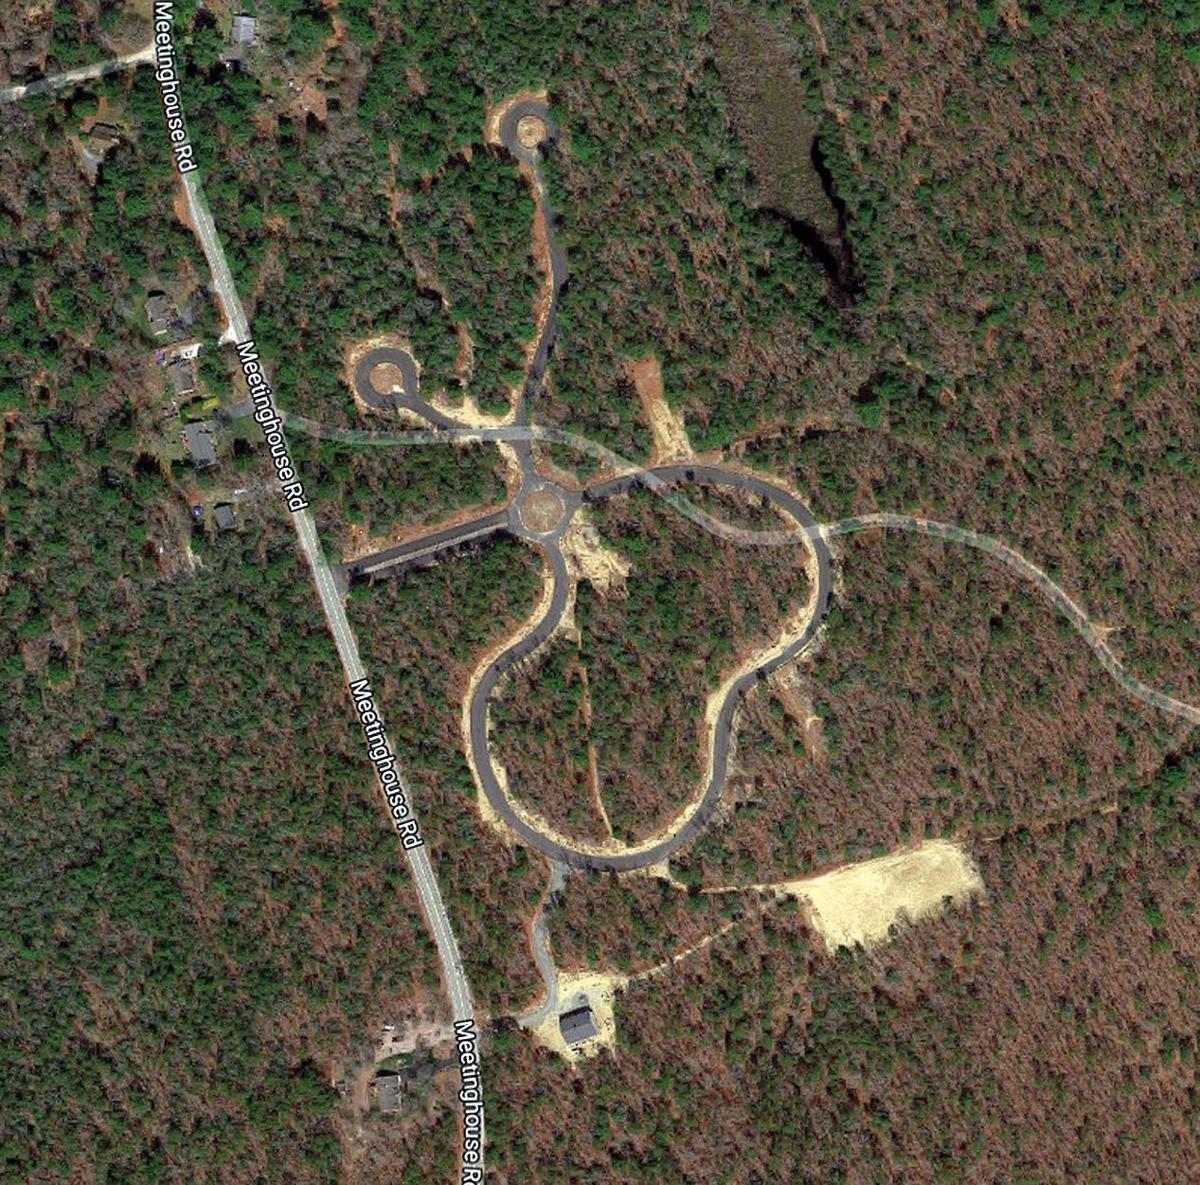 Mashpee Wampanoag Village - Aerial View